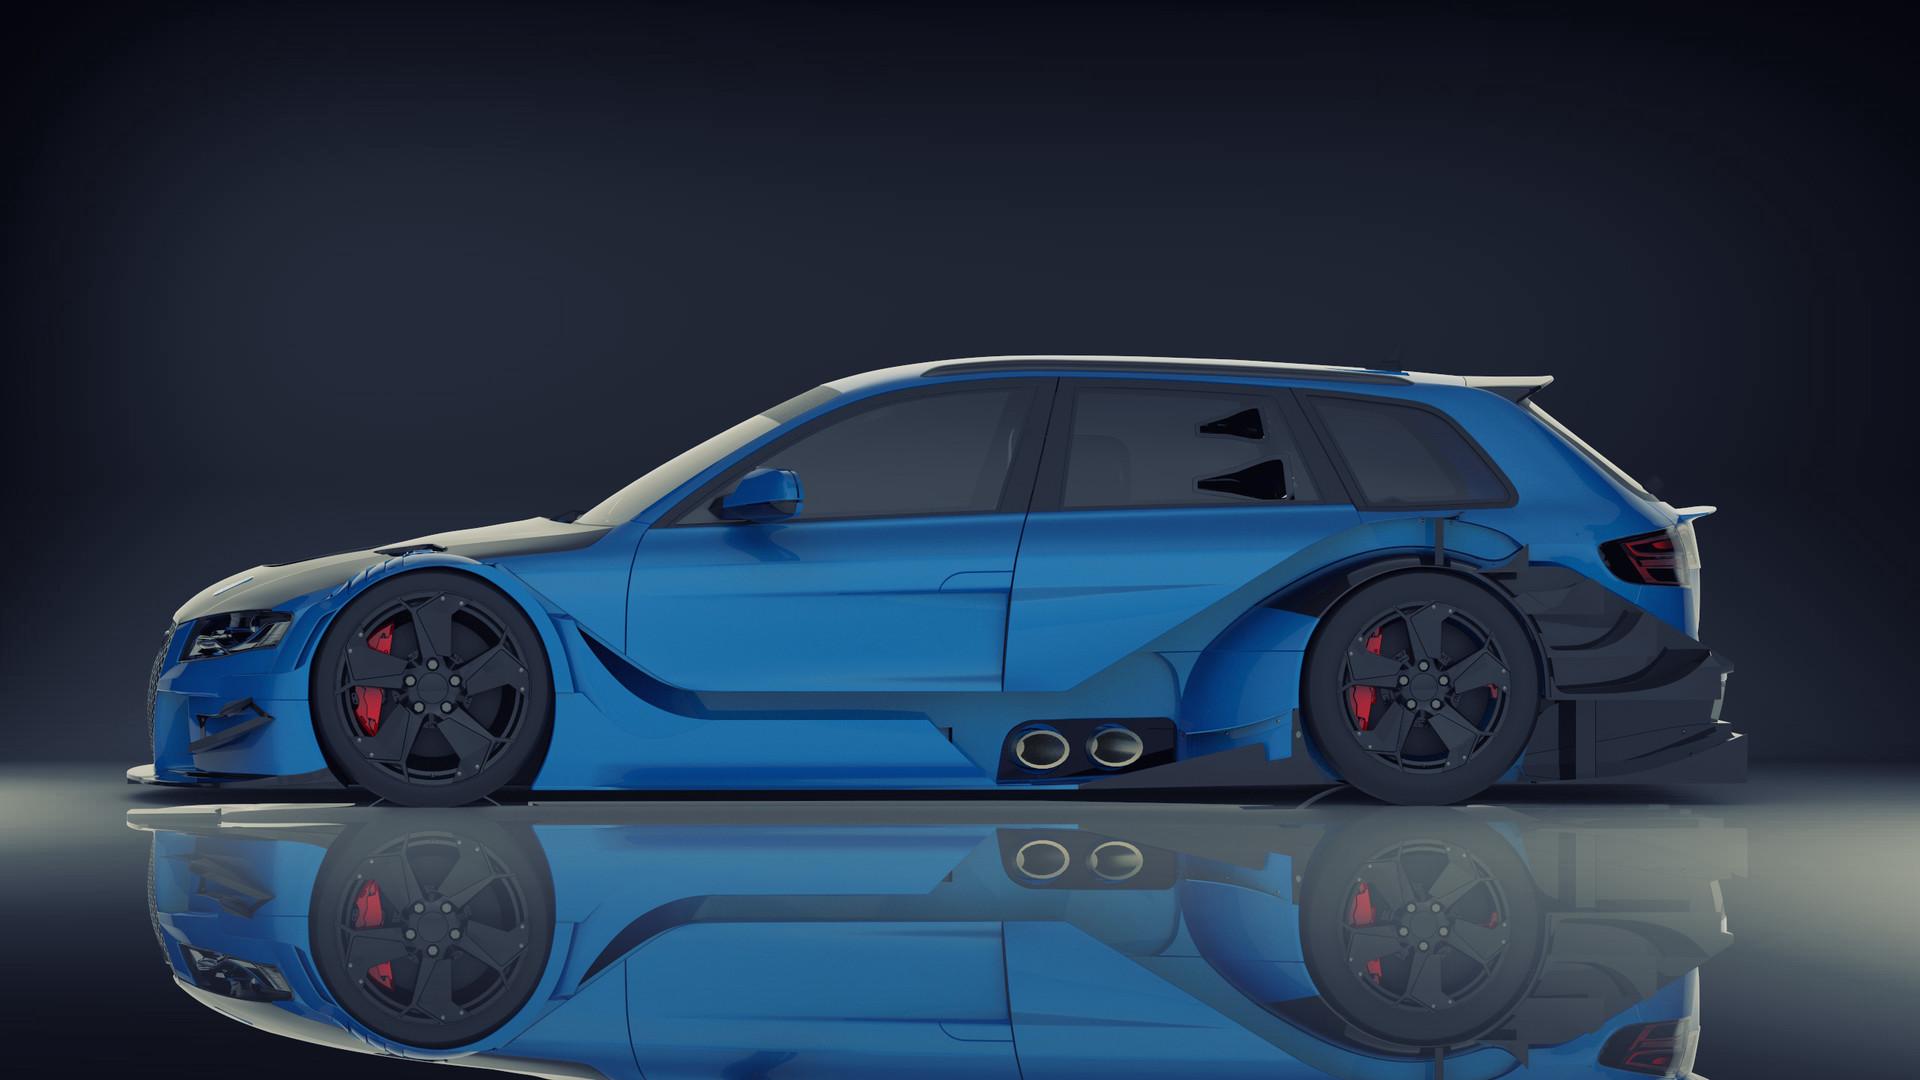 Serhii Buriachkivskyi Audi Rs6 Dtm